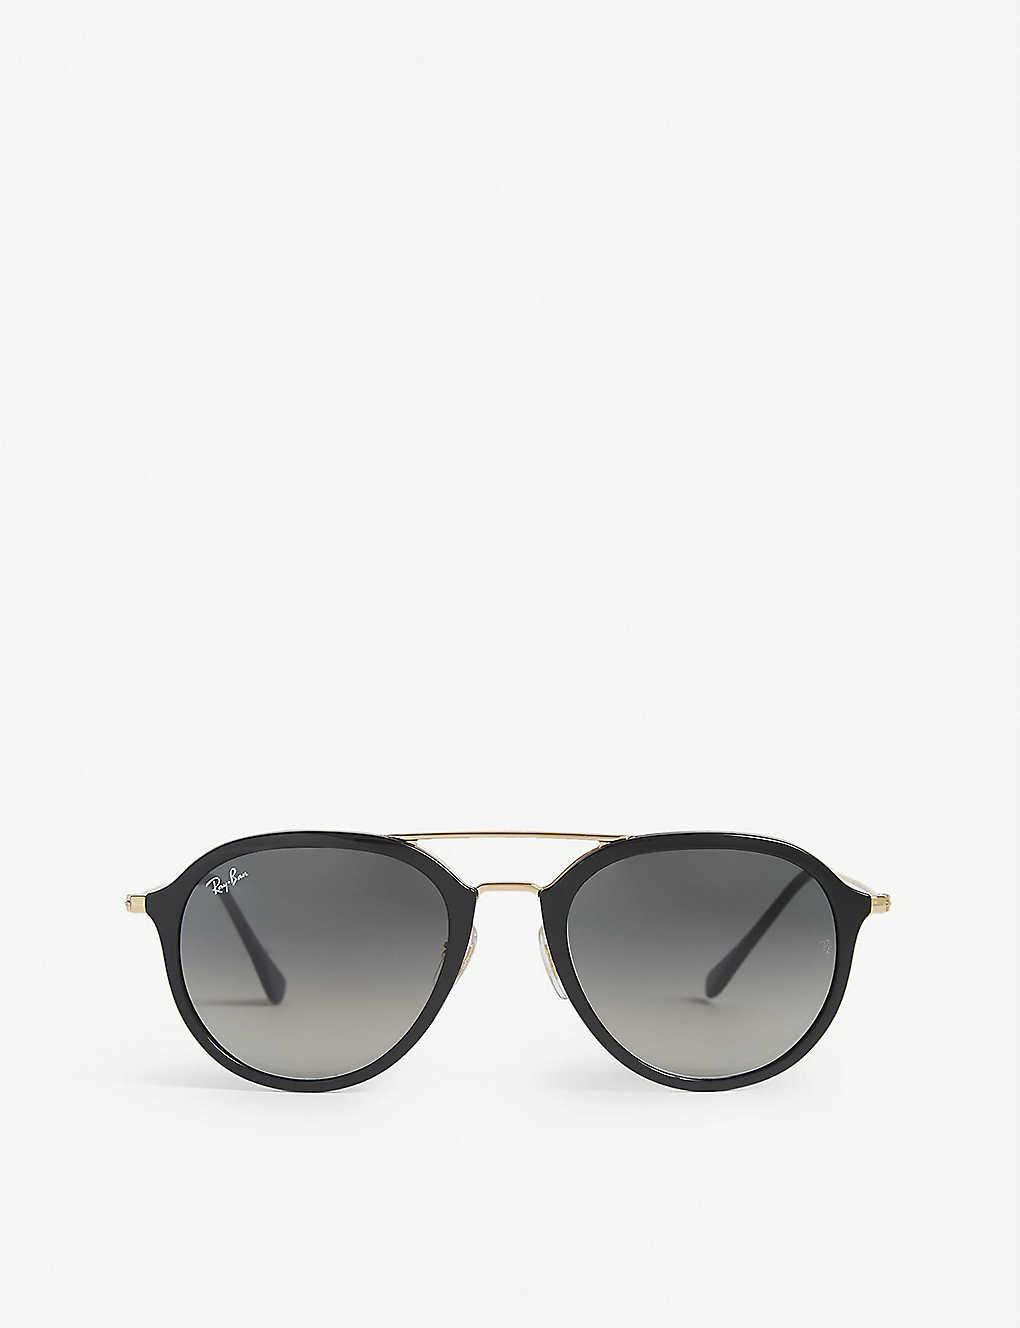 Rb4253 Ray Frame Ban Round Double Bridge Sunglasses vY7yIbf6gm